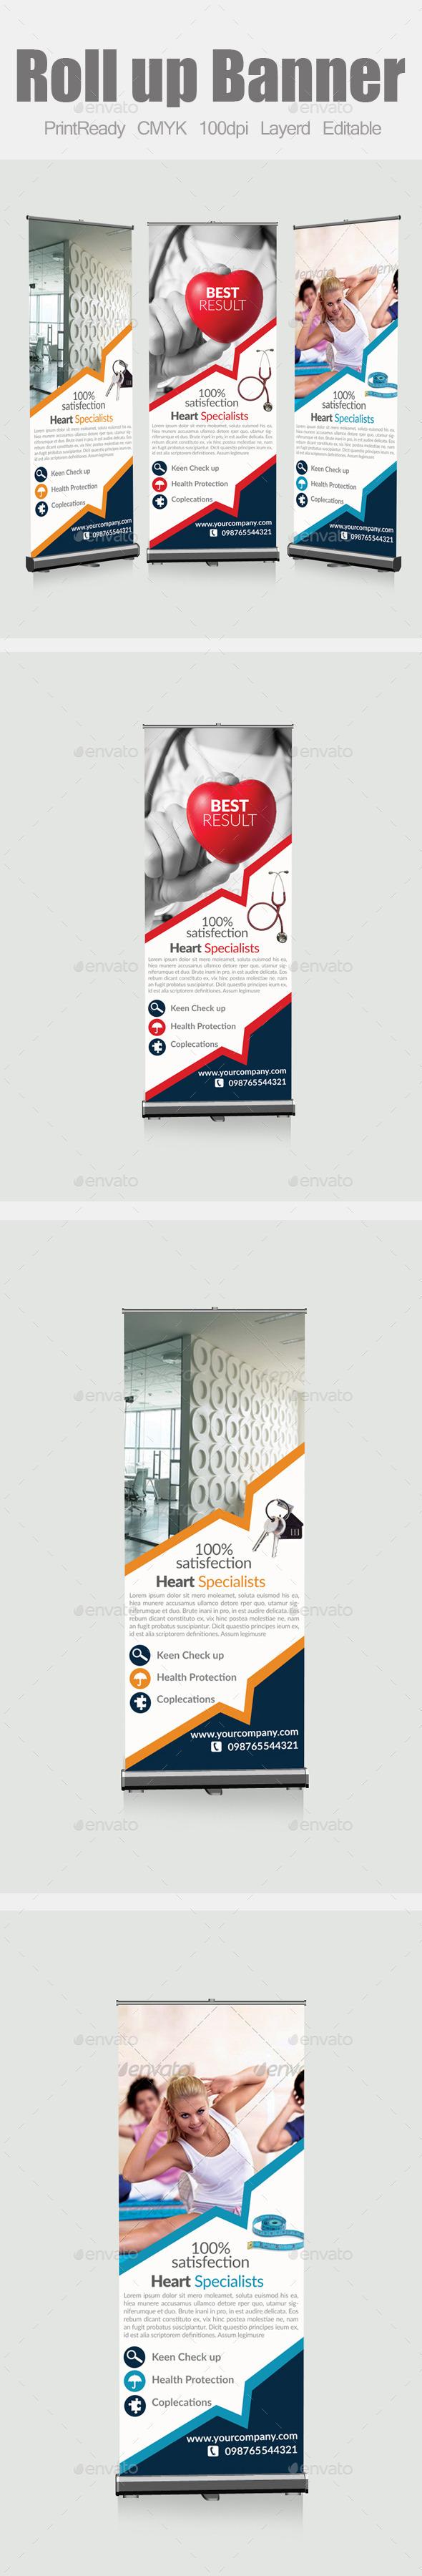 GraphicRiver Multi Purpose Roll Up Banners 9068096